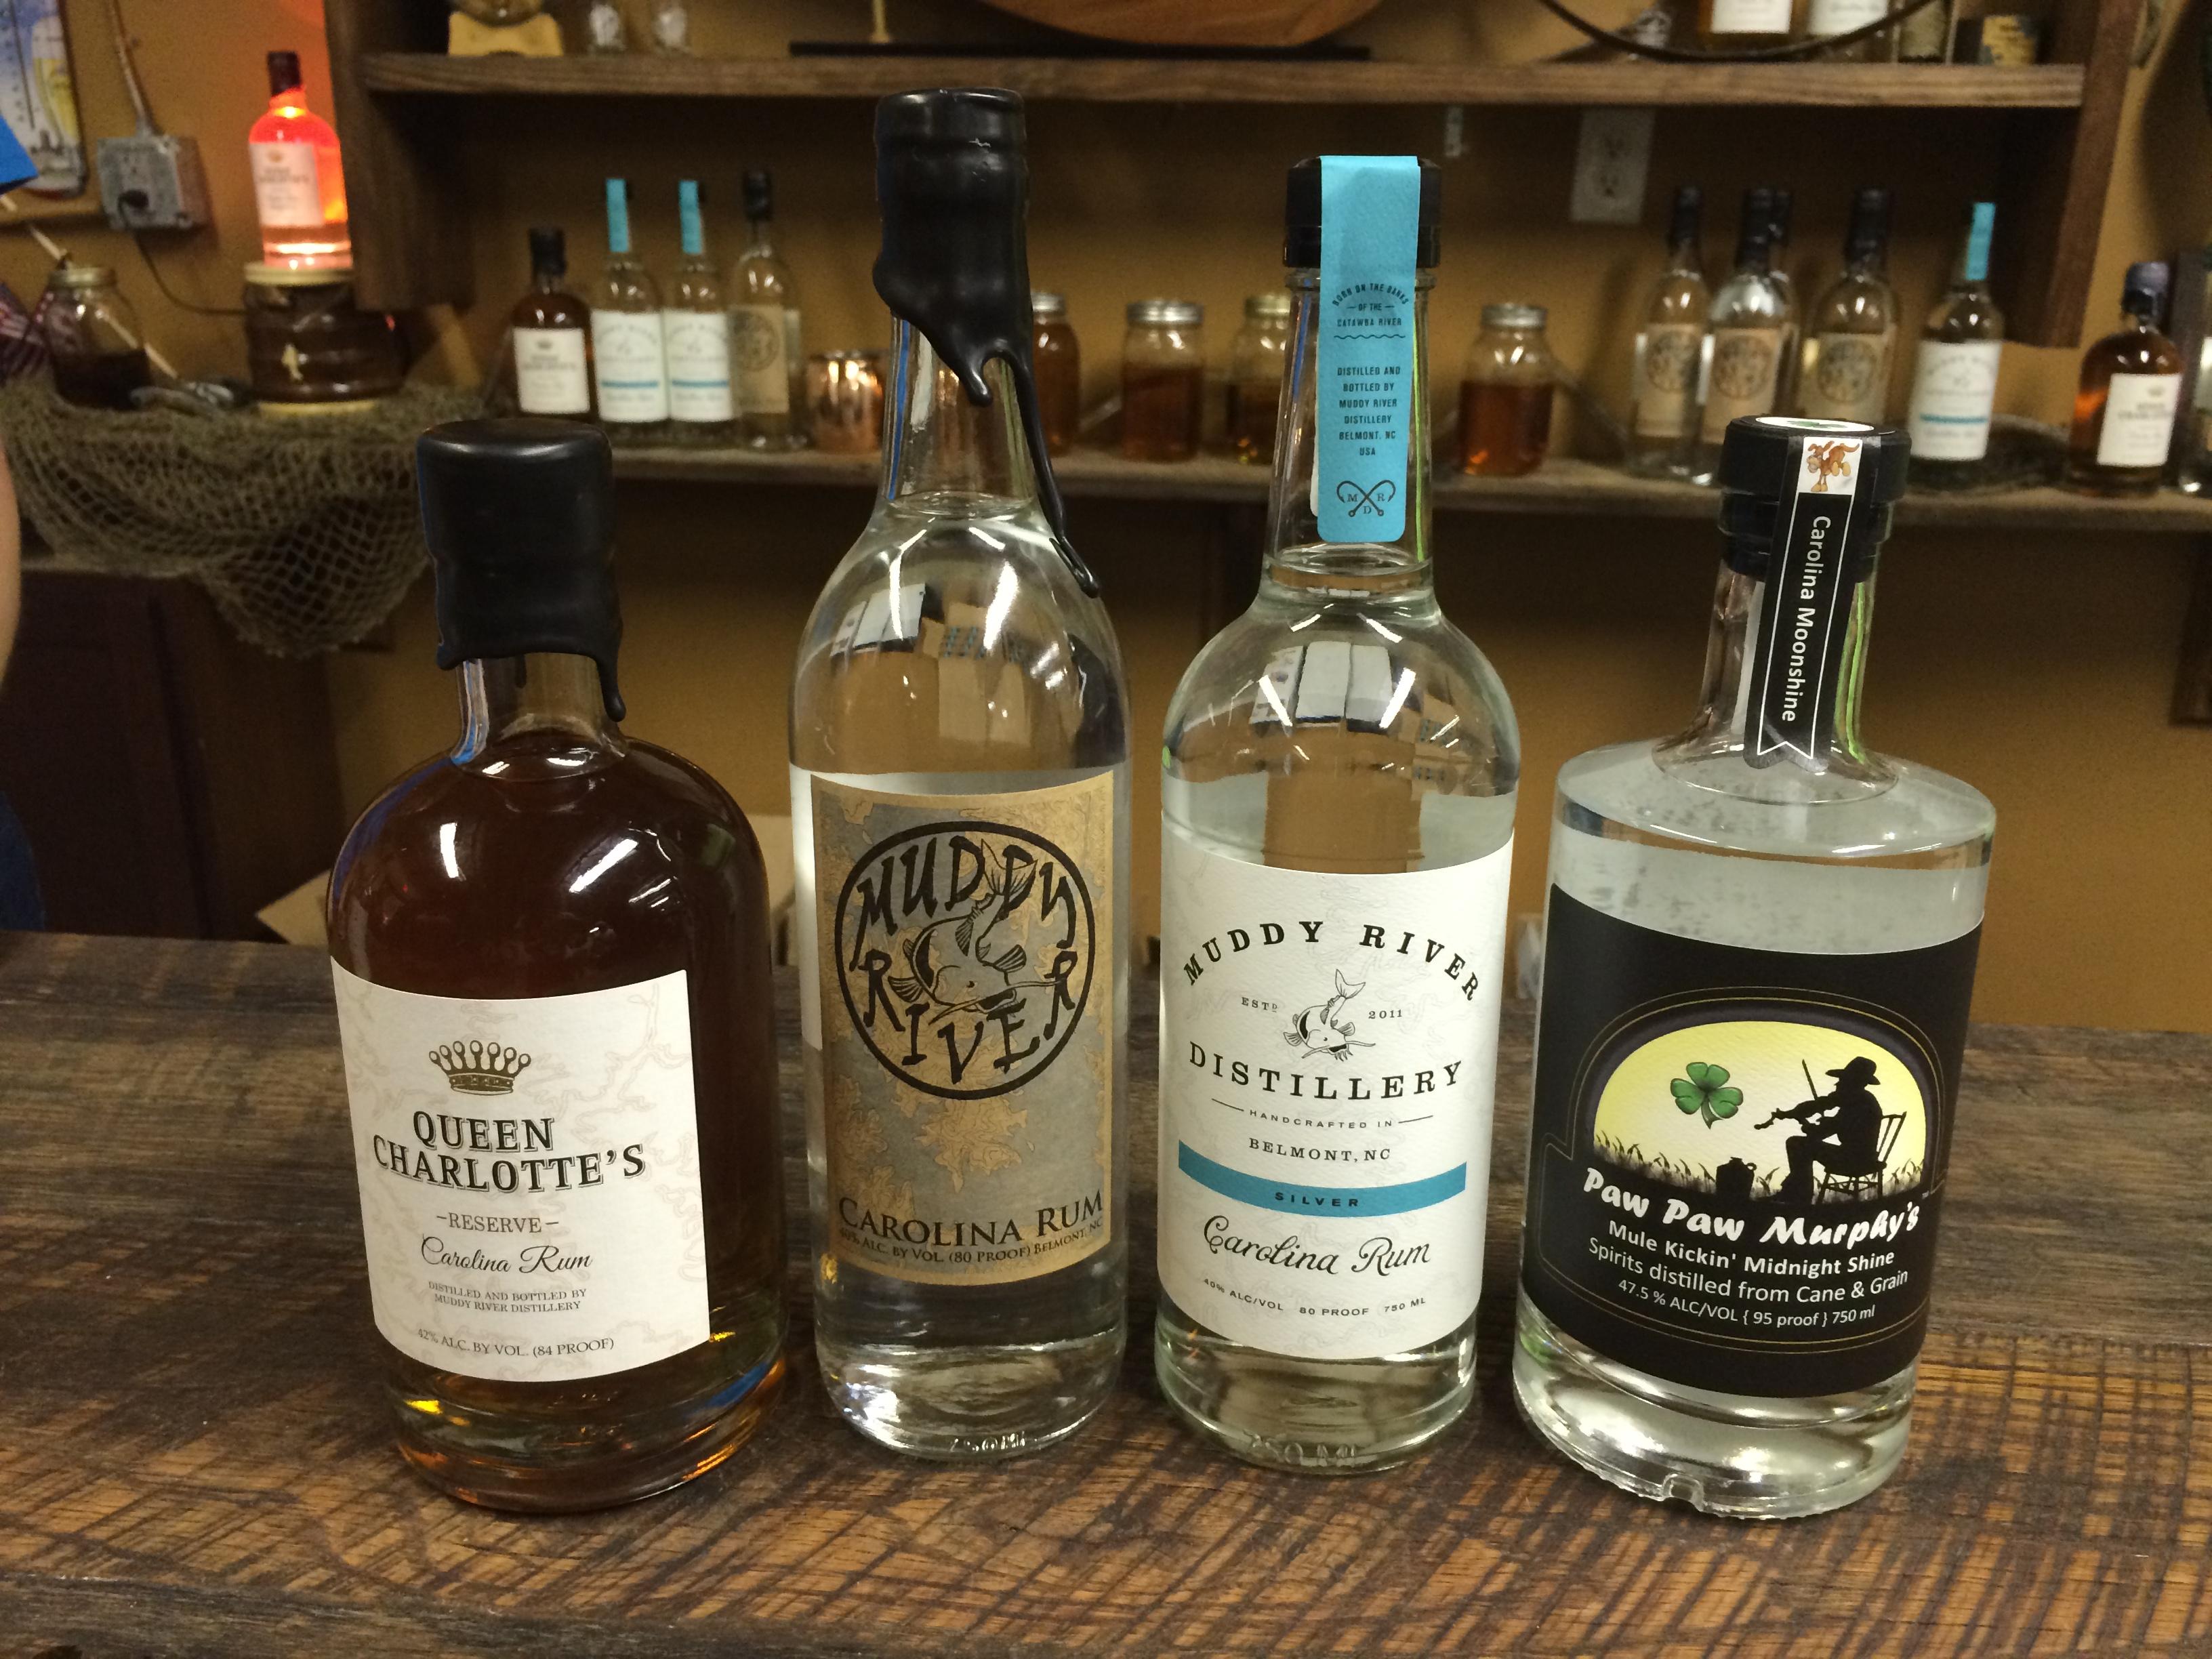 Muddy River Distillery S Handcrafted Carolina Rum Crushes